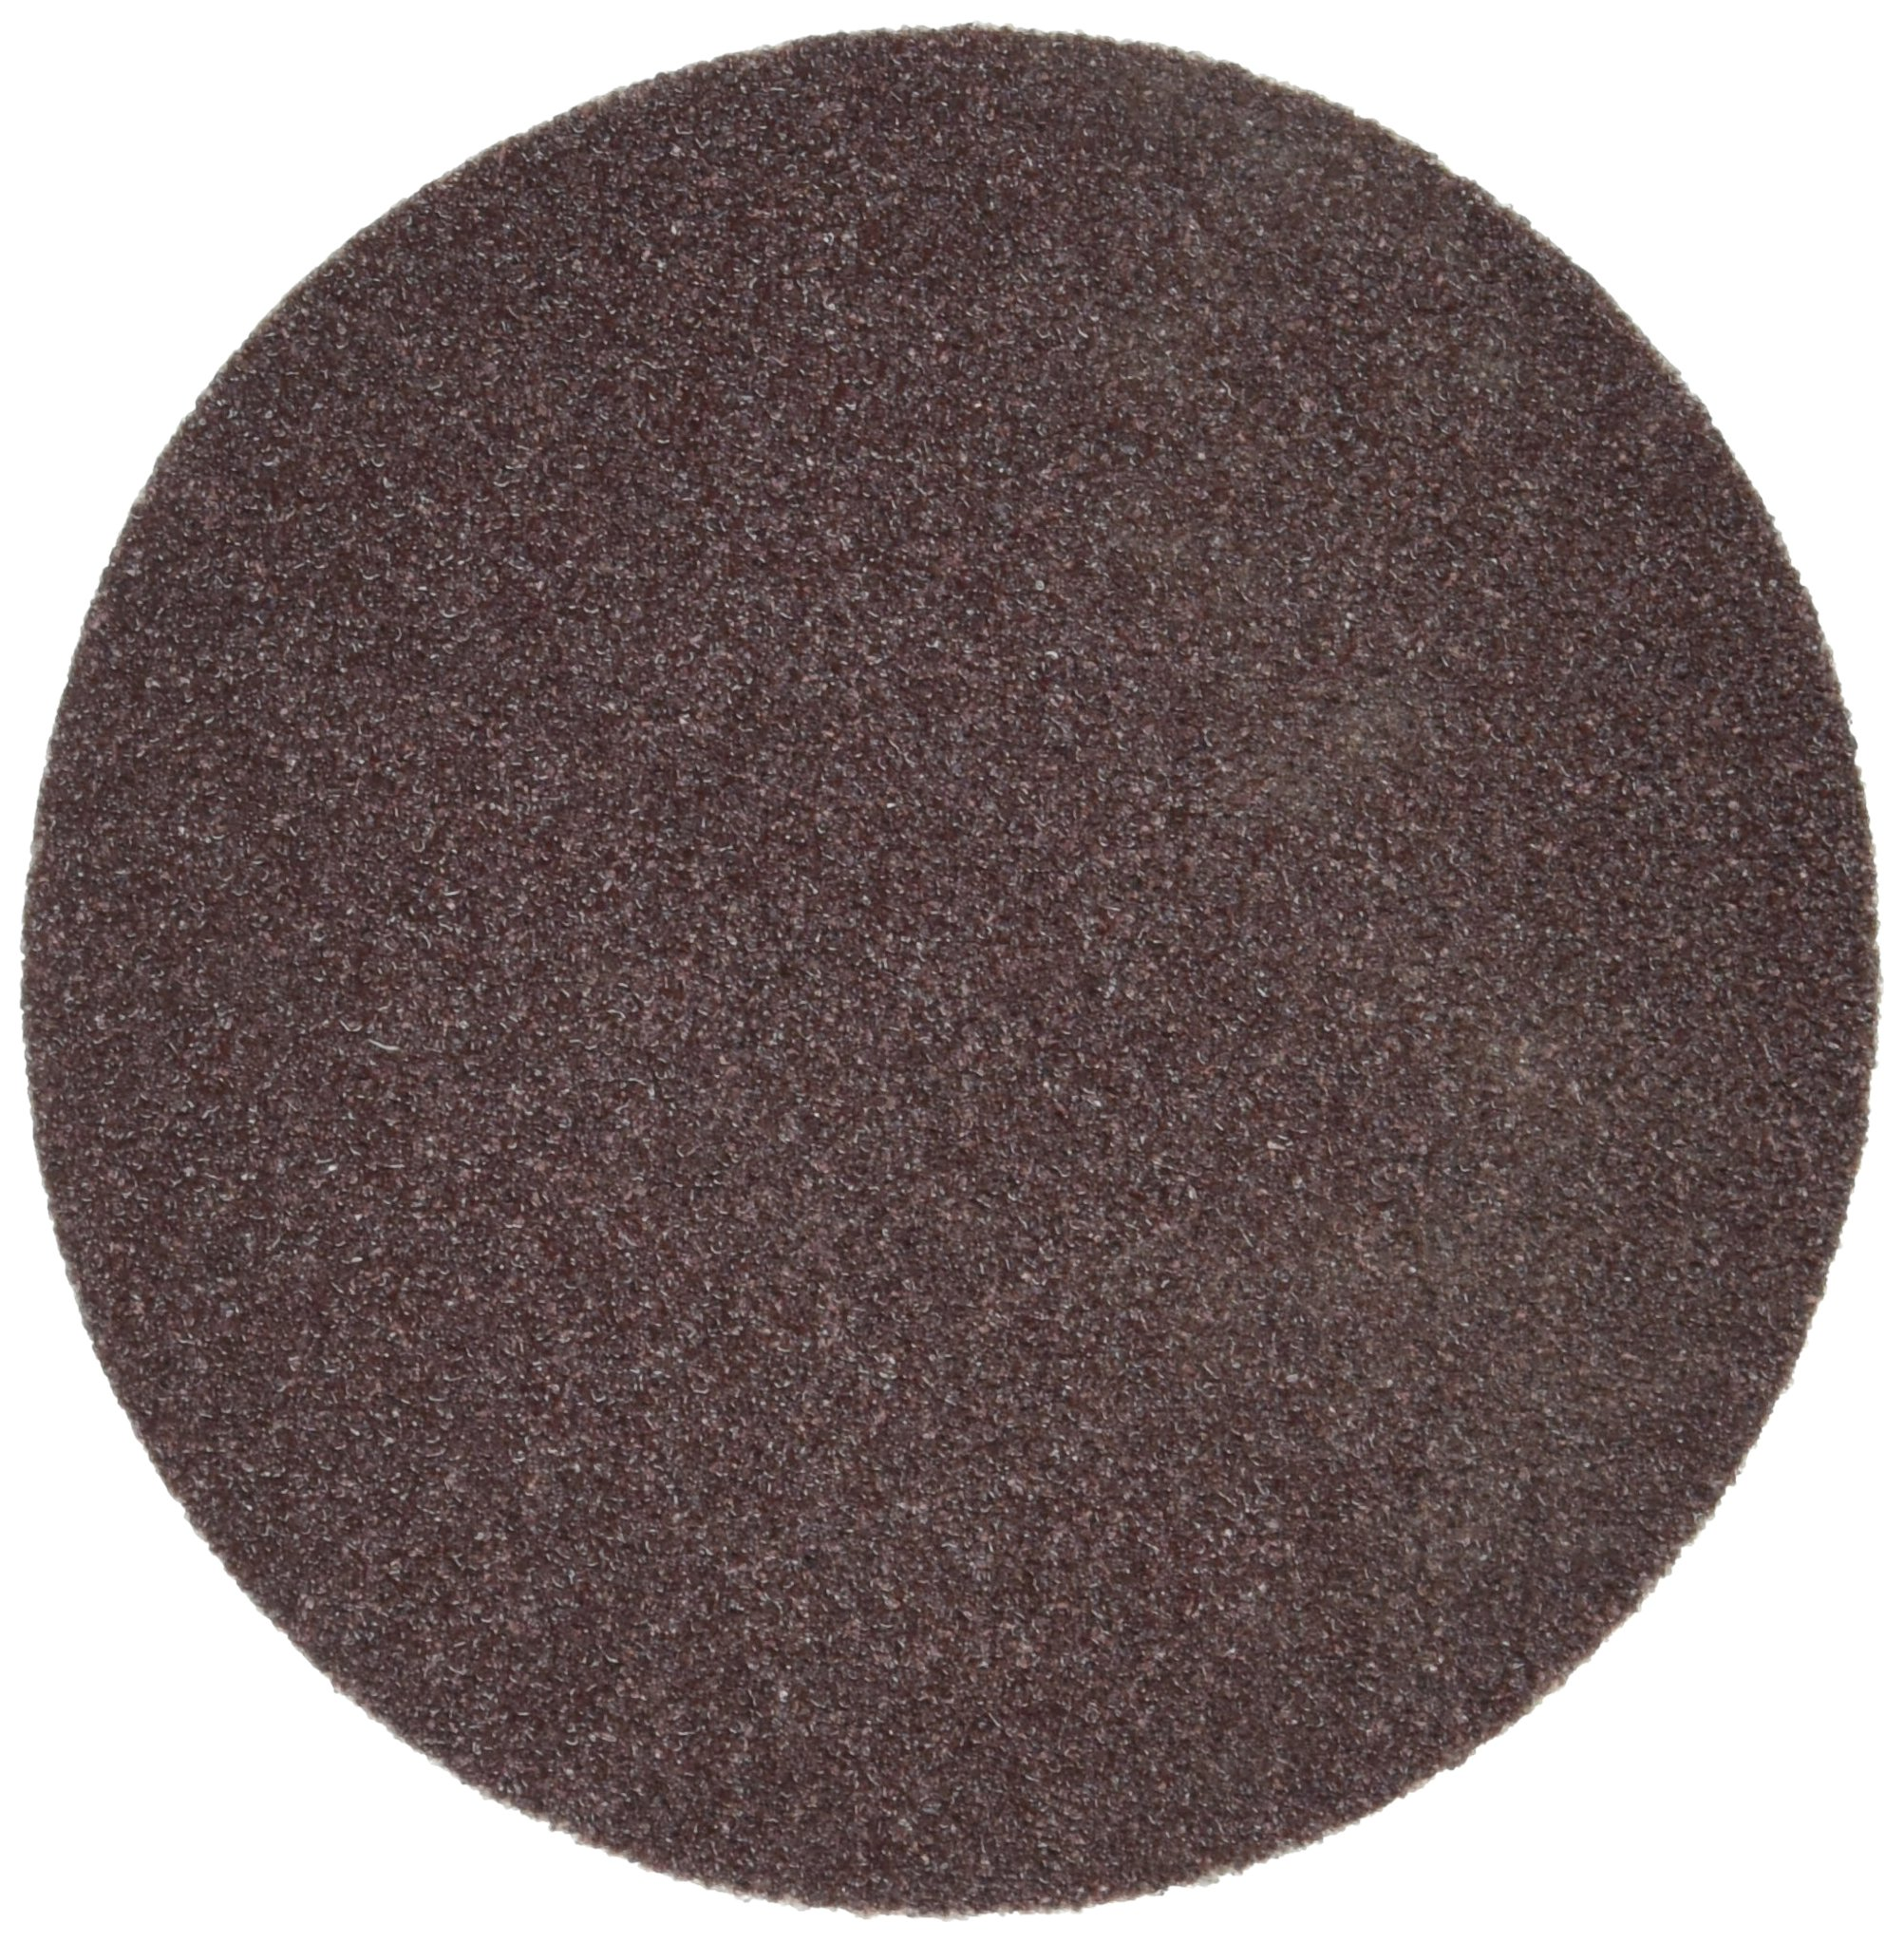 Festool 485245 P50 Grit, Saphir Abrasives, Pack of 25 by Festool